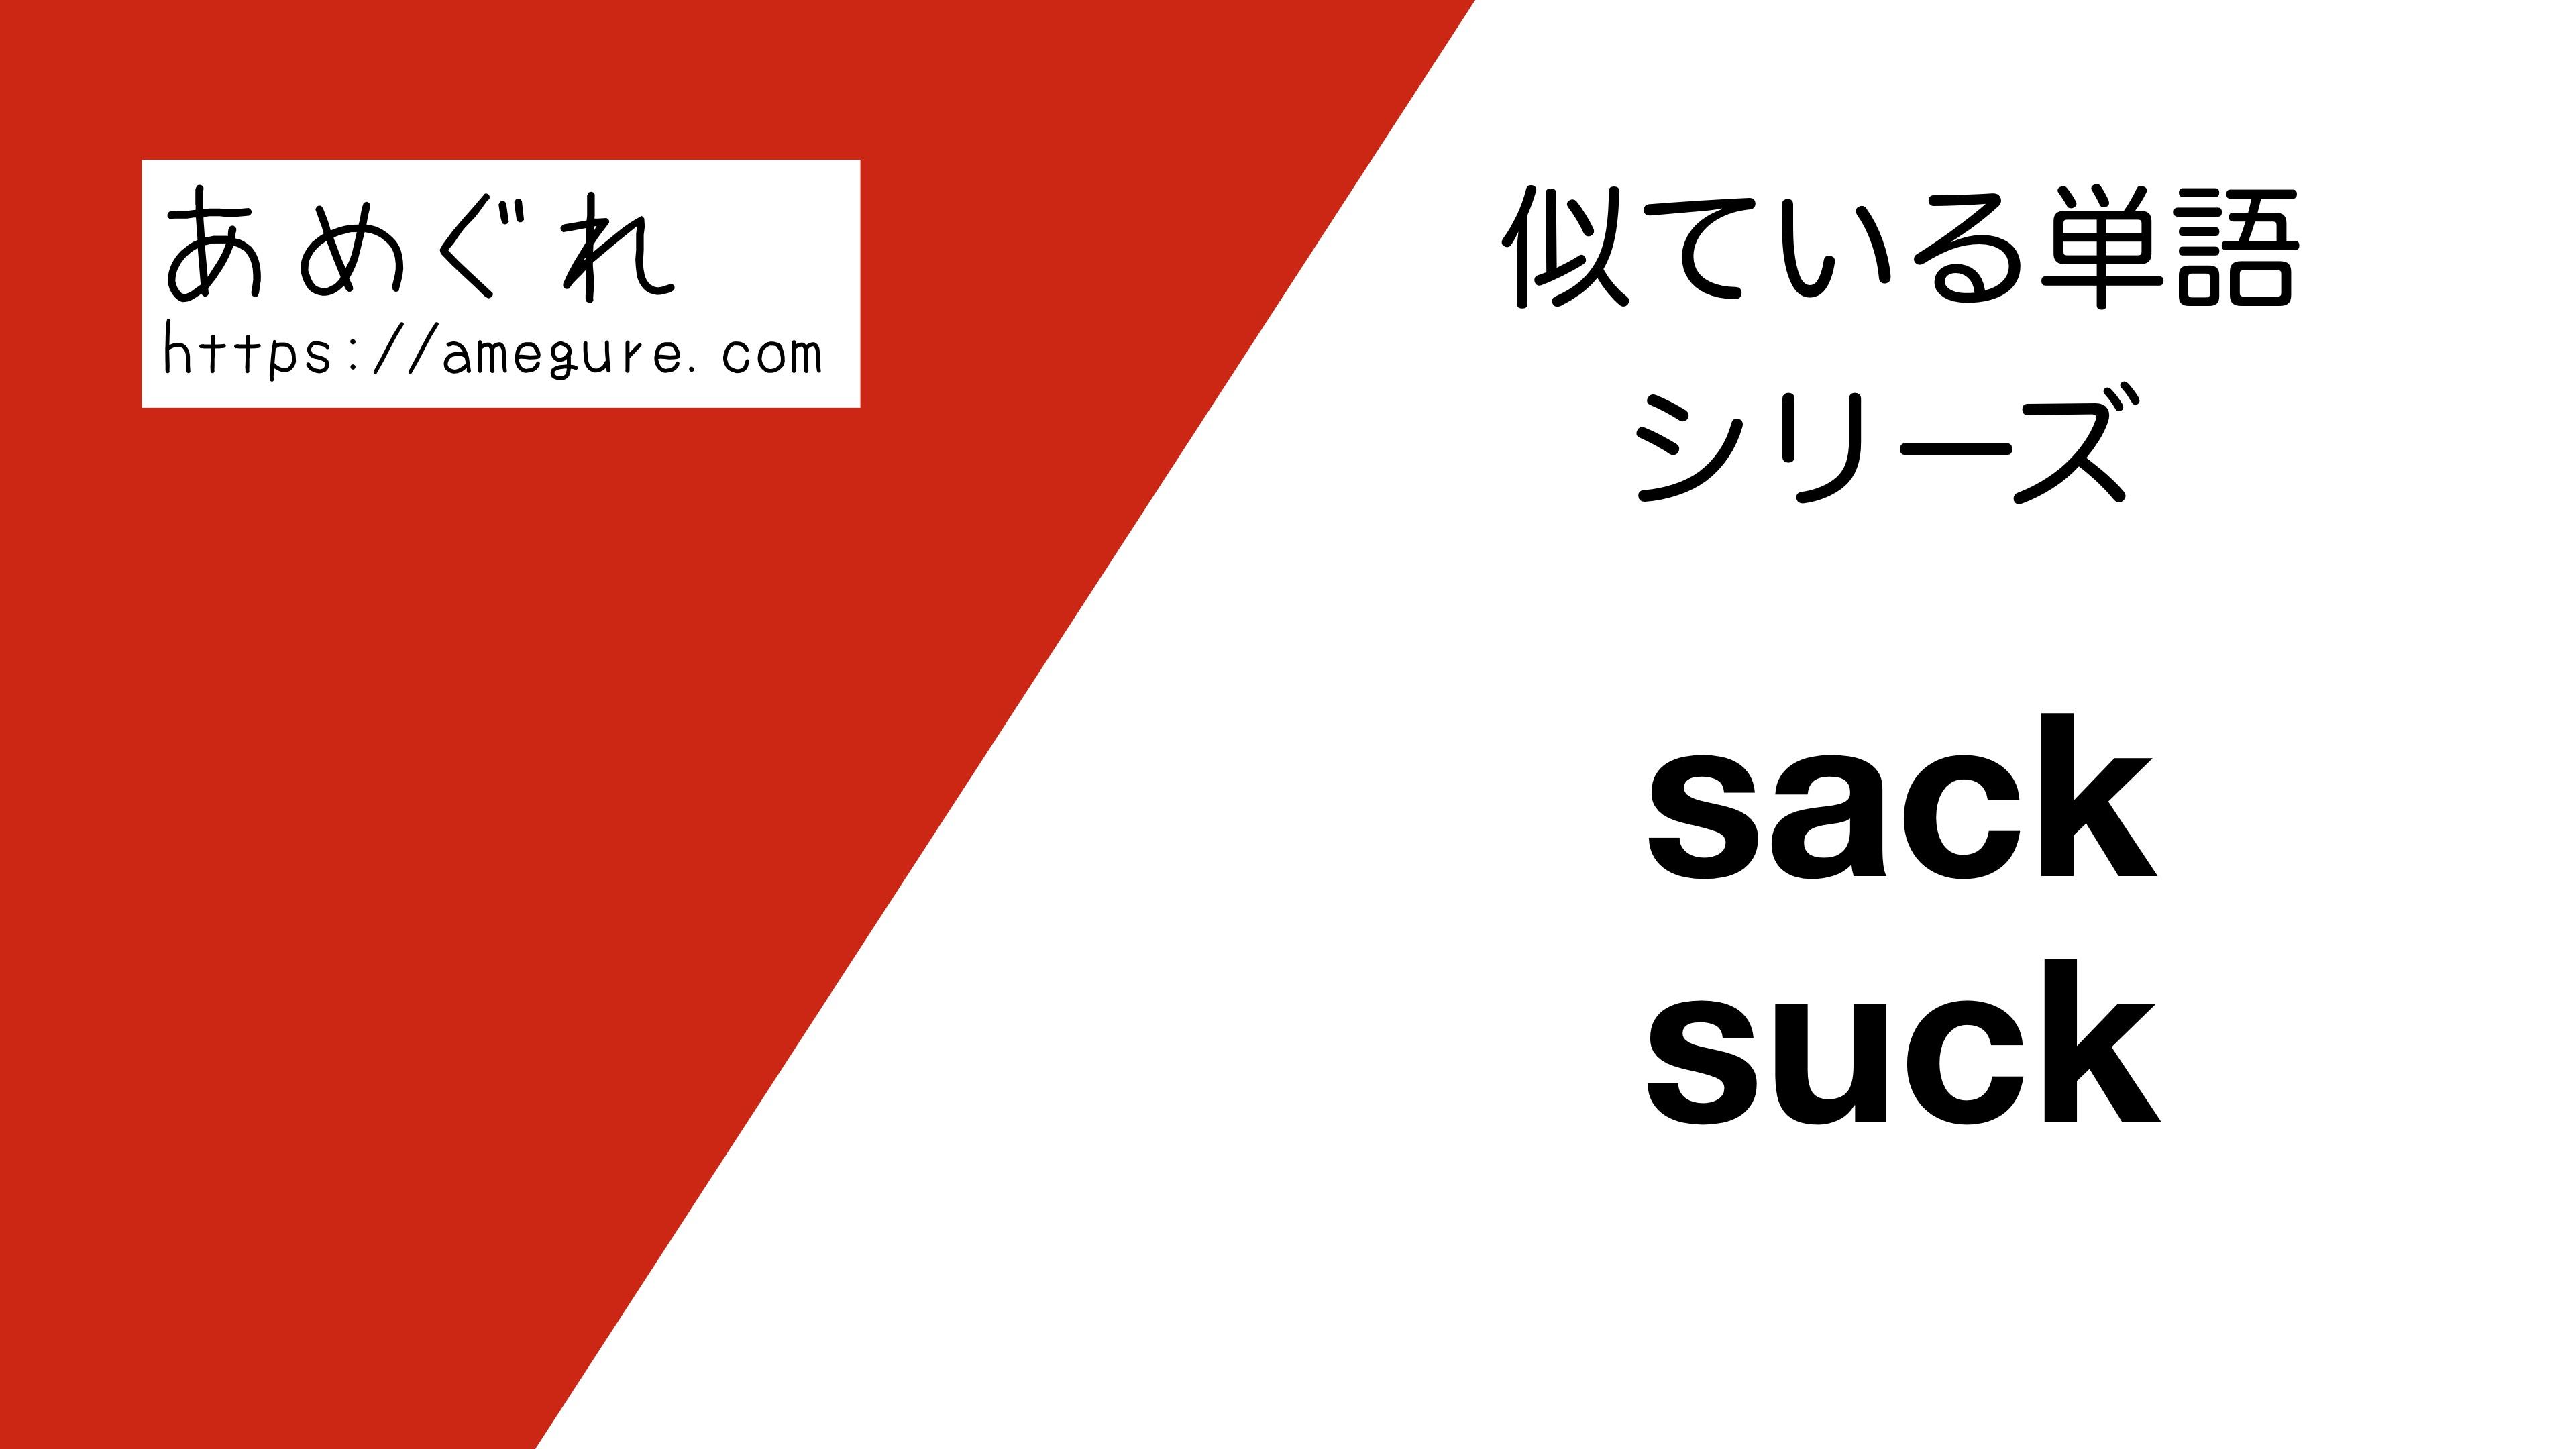 sack-suck違い